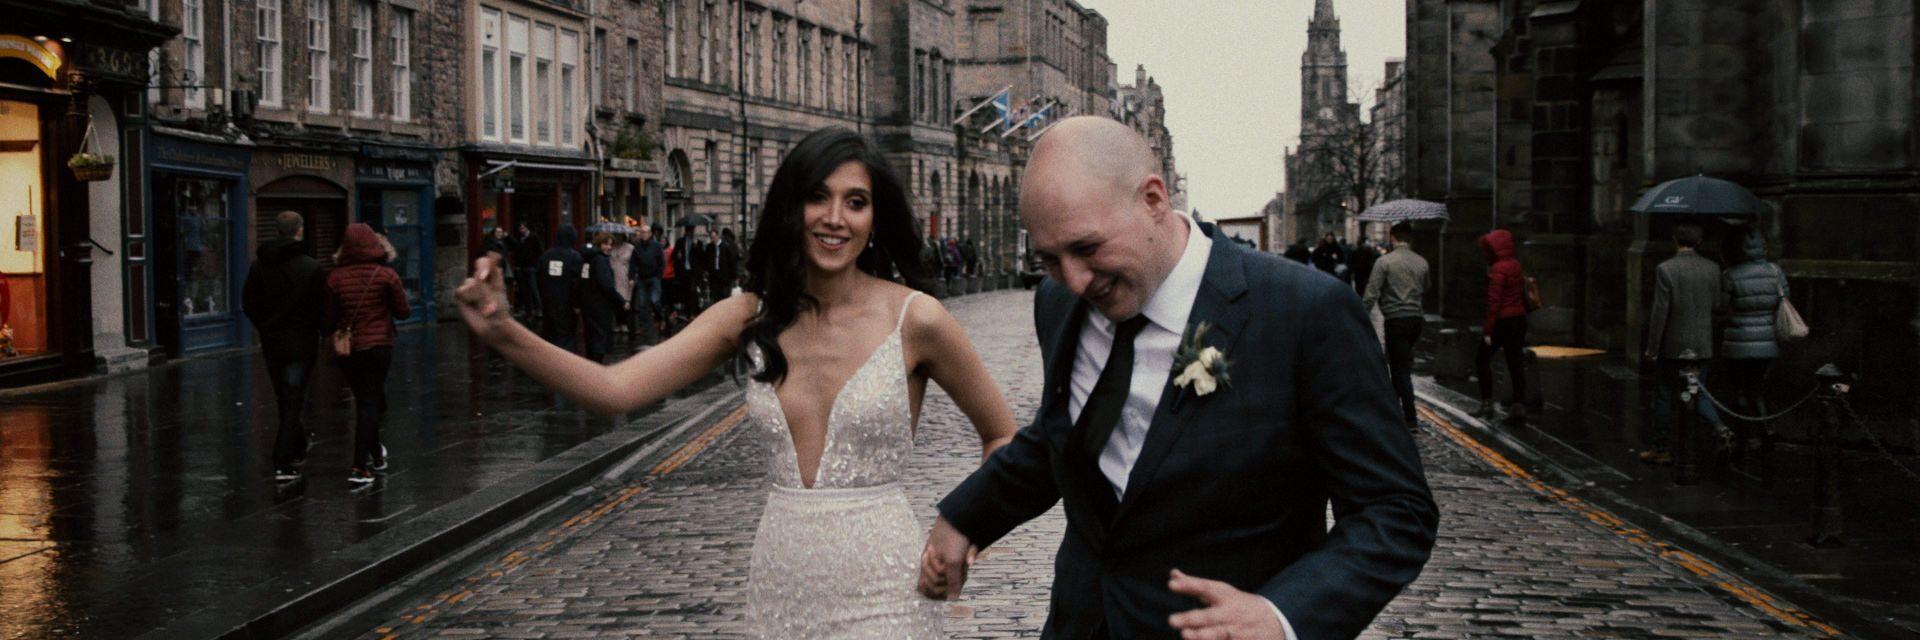 Rabat-wedding-videographer-cinemate-films-04